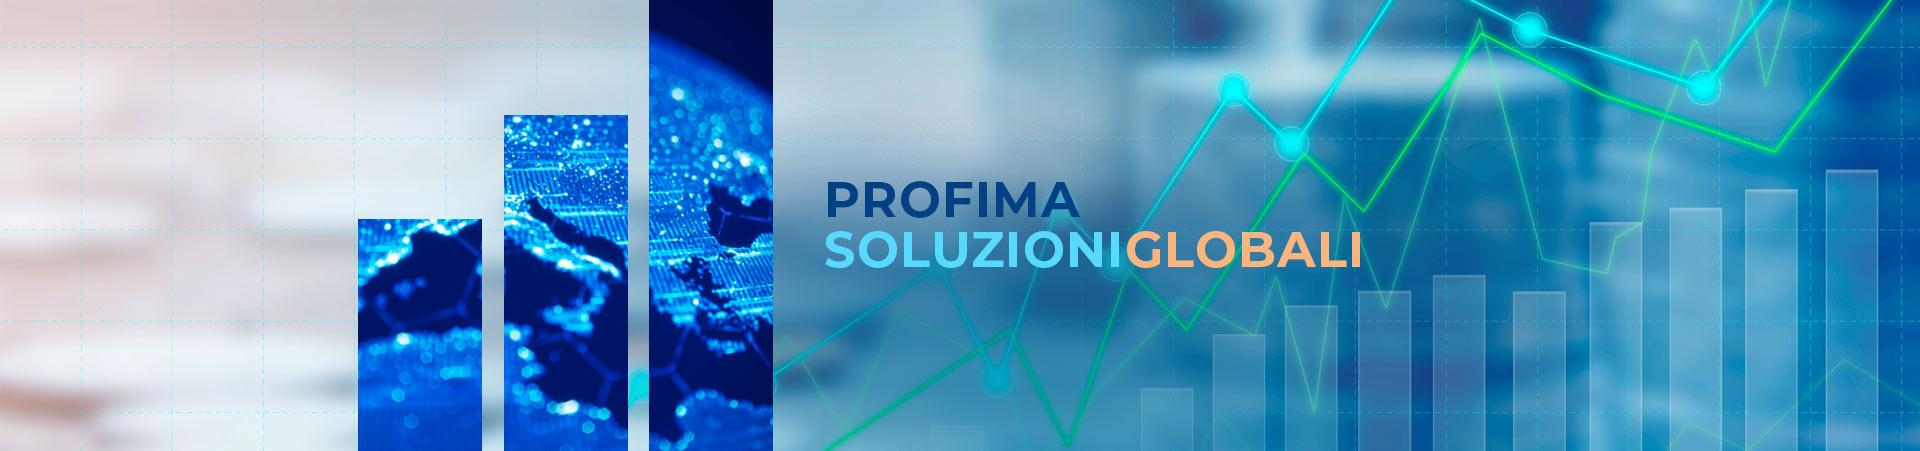 Profima Soluzioni Globali